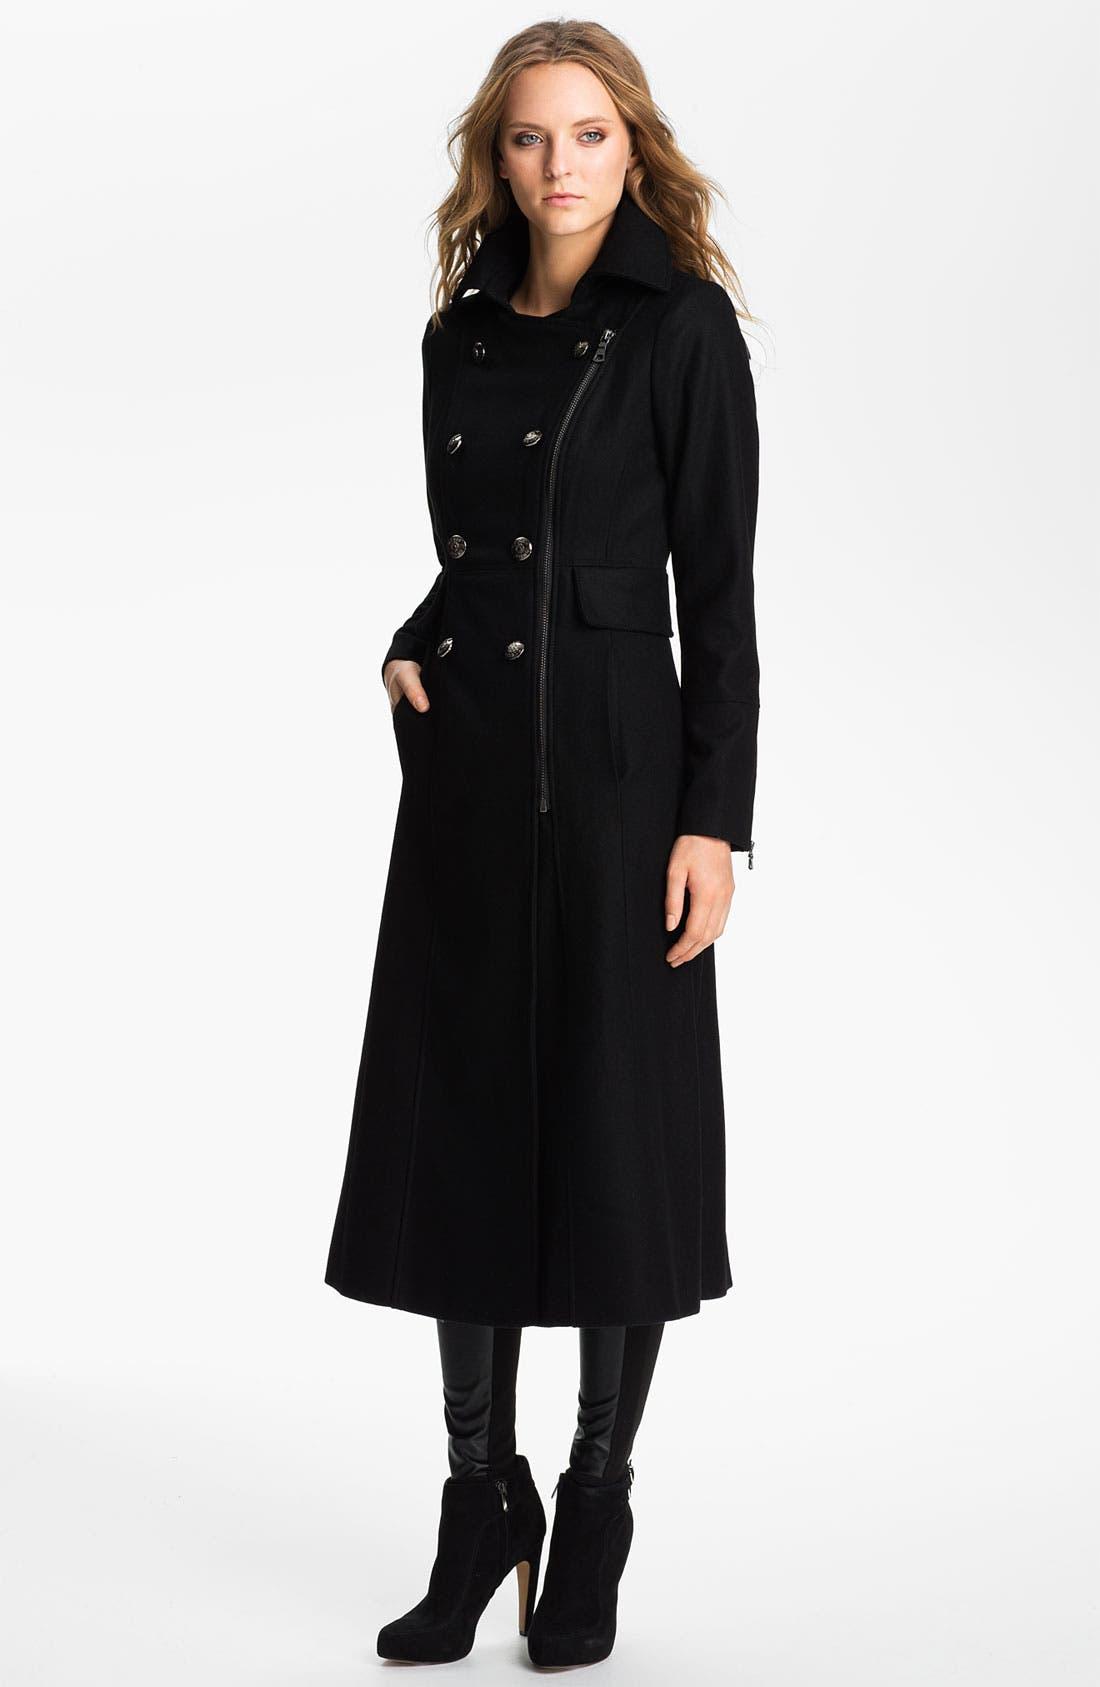 Alternate Image 1 Selected - GUESS Zip Front Wool Blend Coat (Online Exclusive)